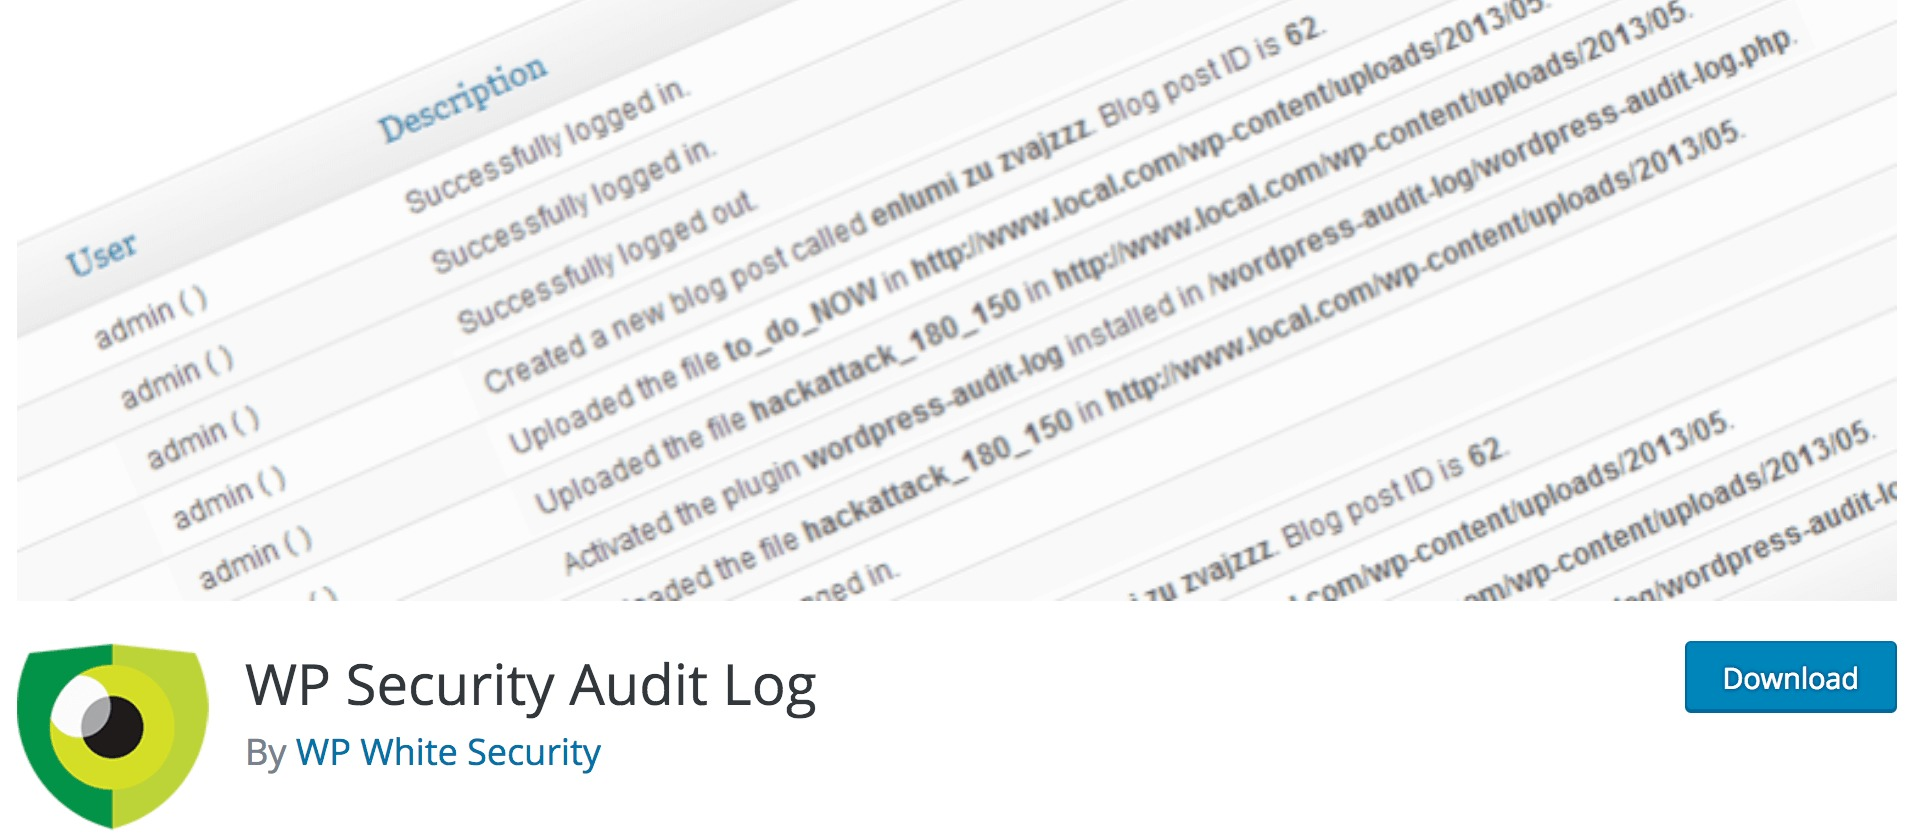 The WP Security Audit Log plugin.